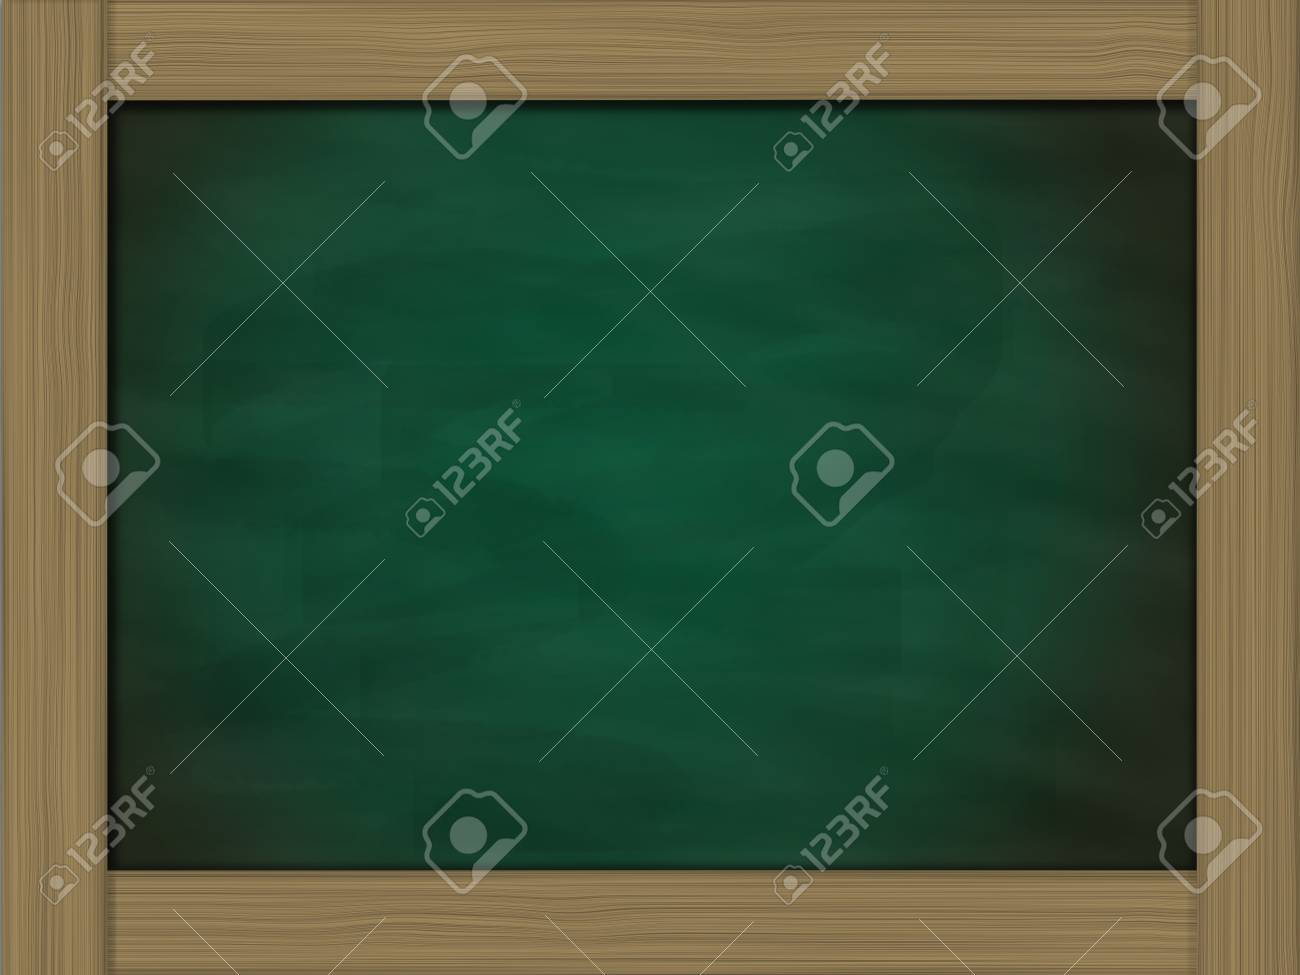 blank grunge green chalkboard and wood frame Stock Photo - 14031878